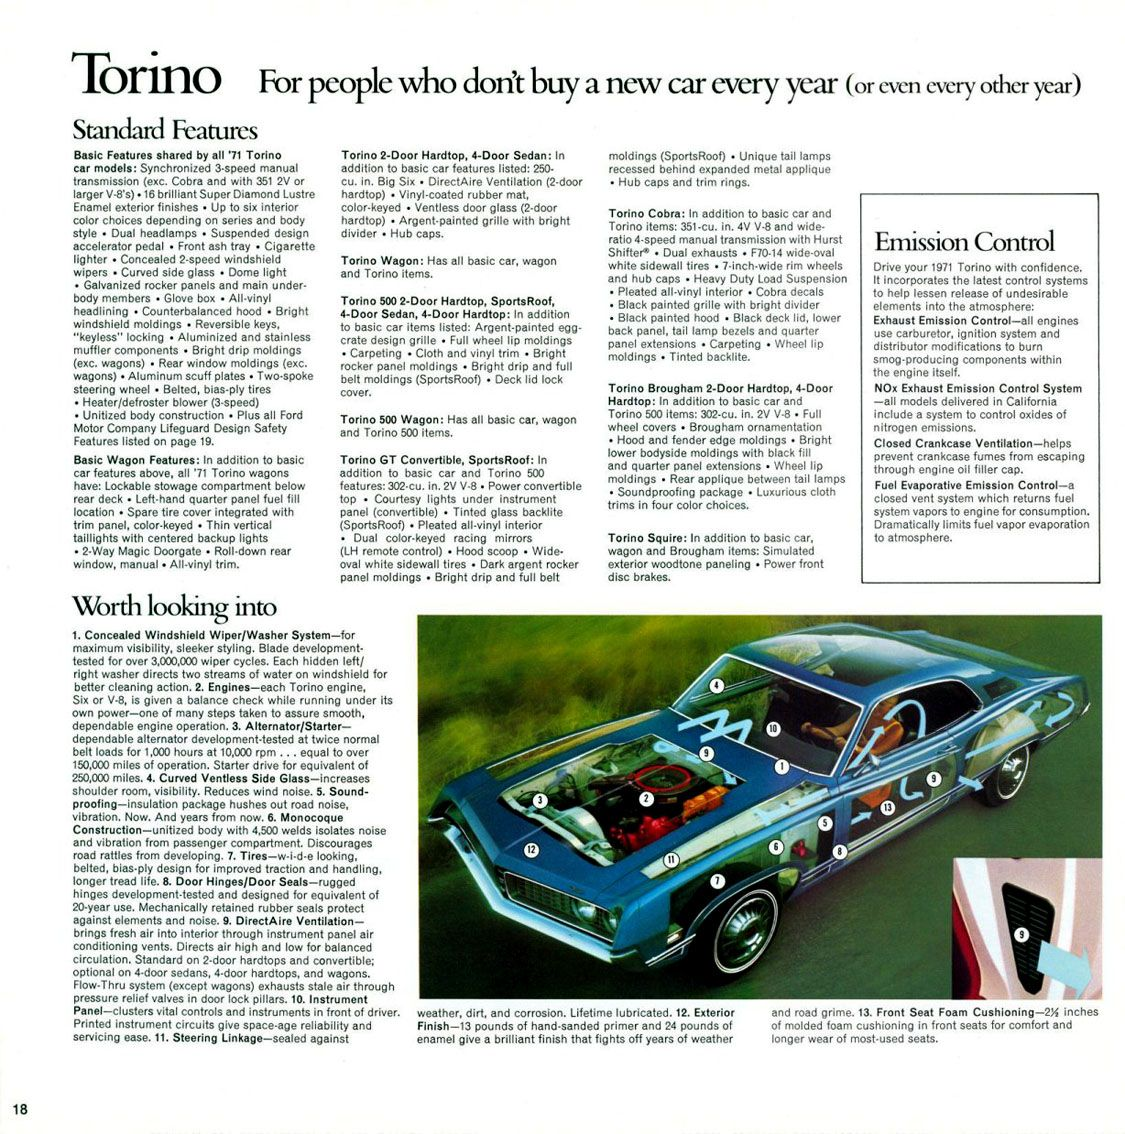 71 Ford Torino Brochure Ford Torino Fairlane Galaxie